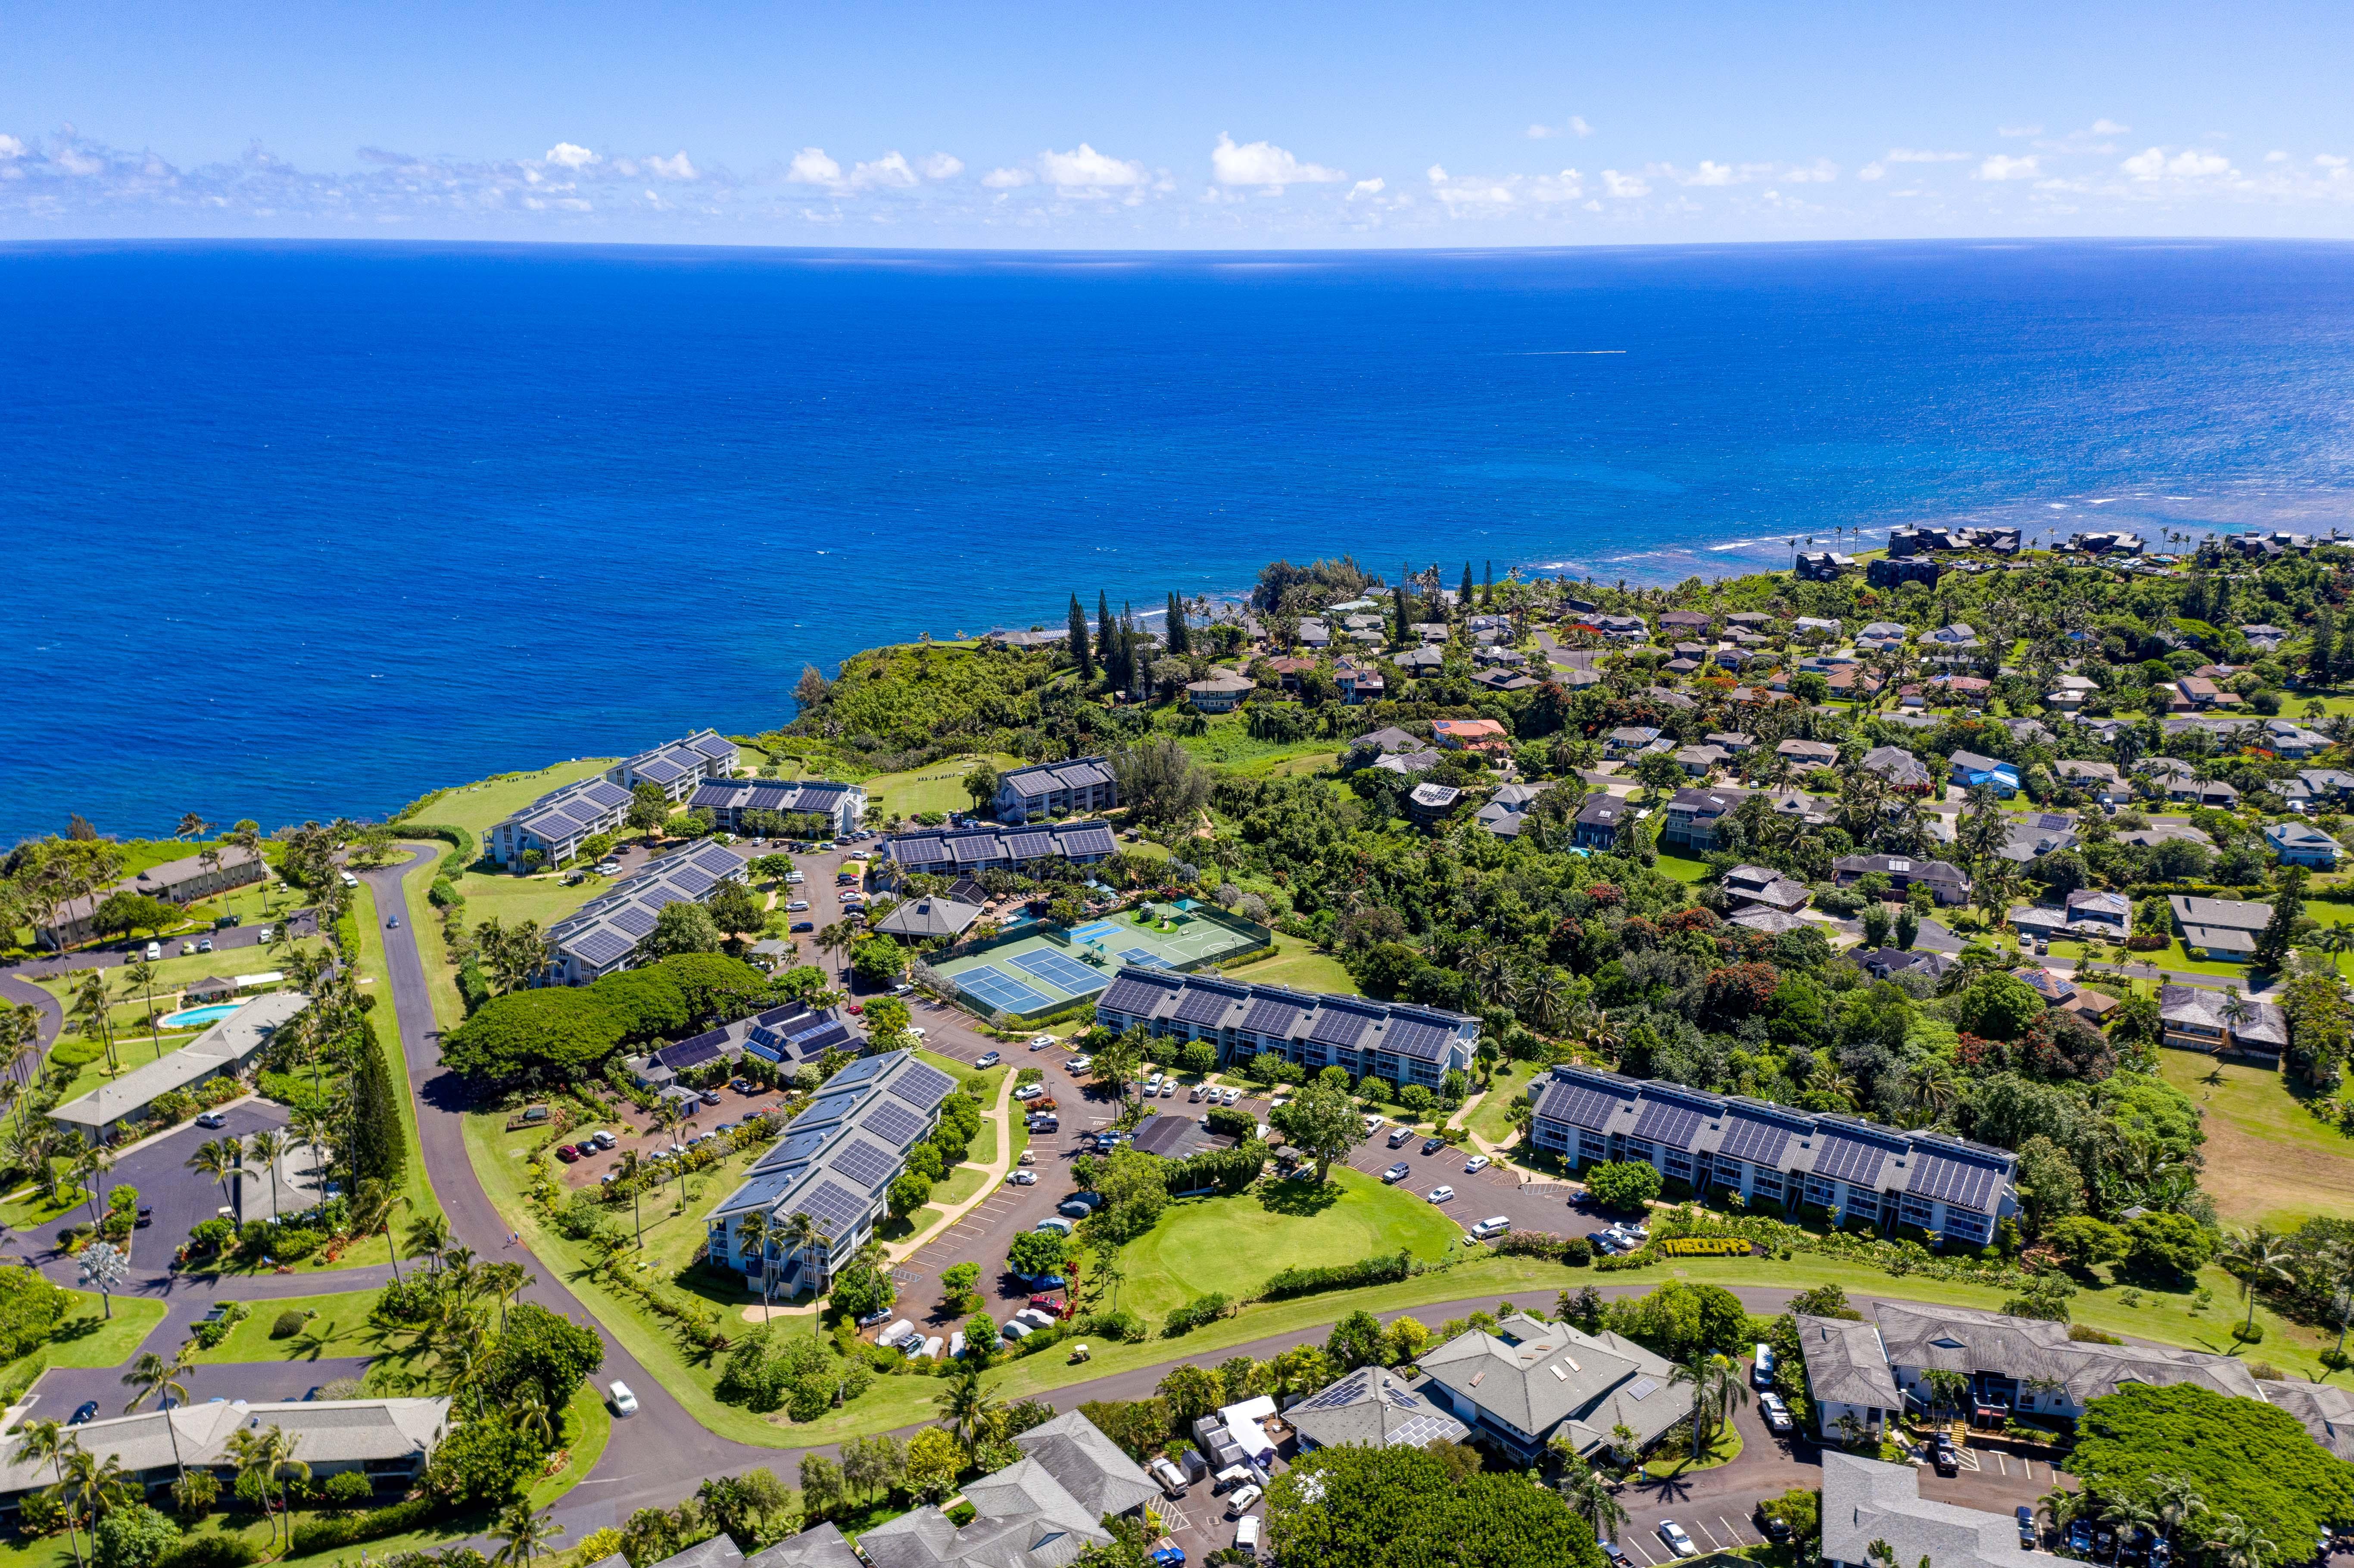 Resort Bubble Kauai, Kauai Vacation Rental